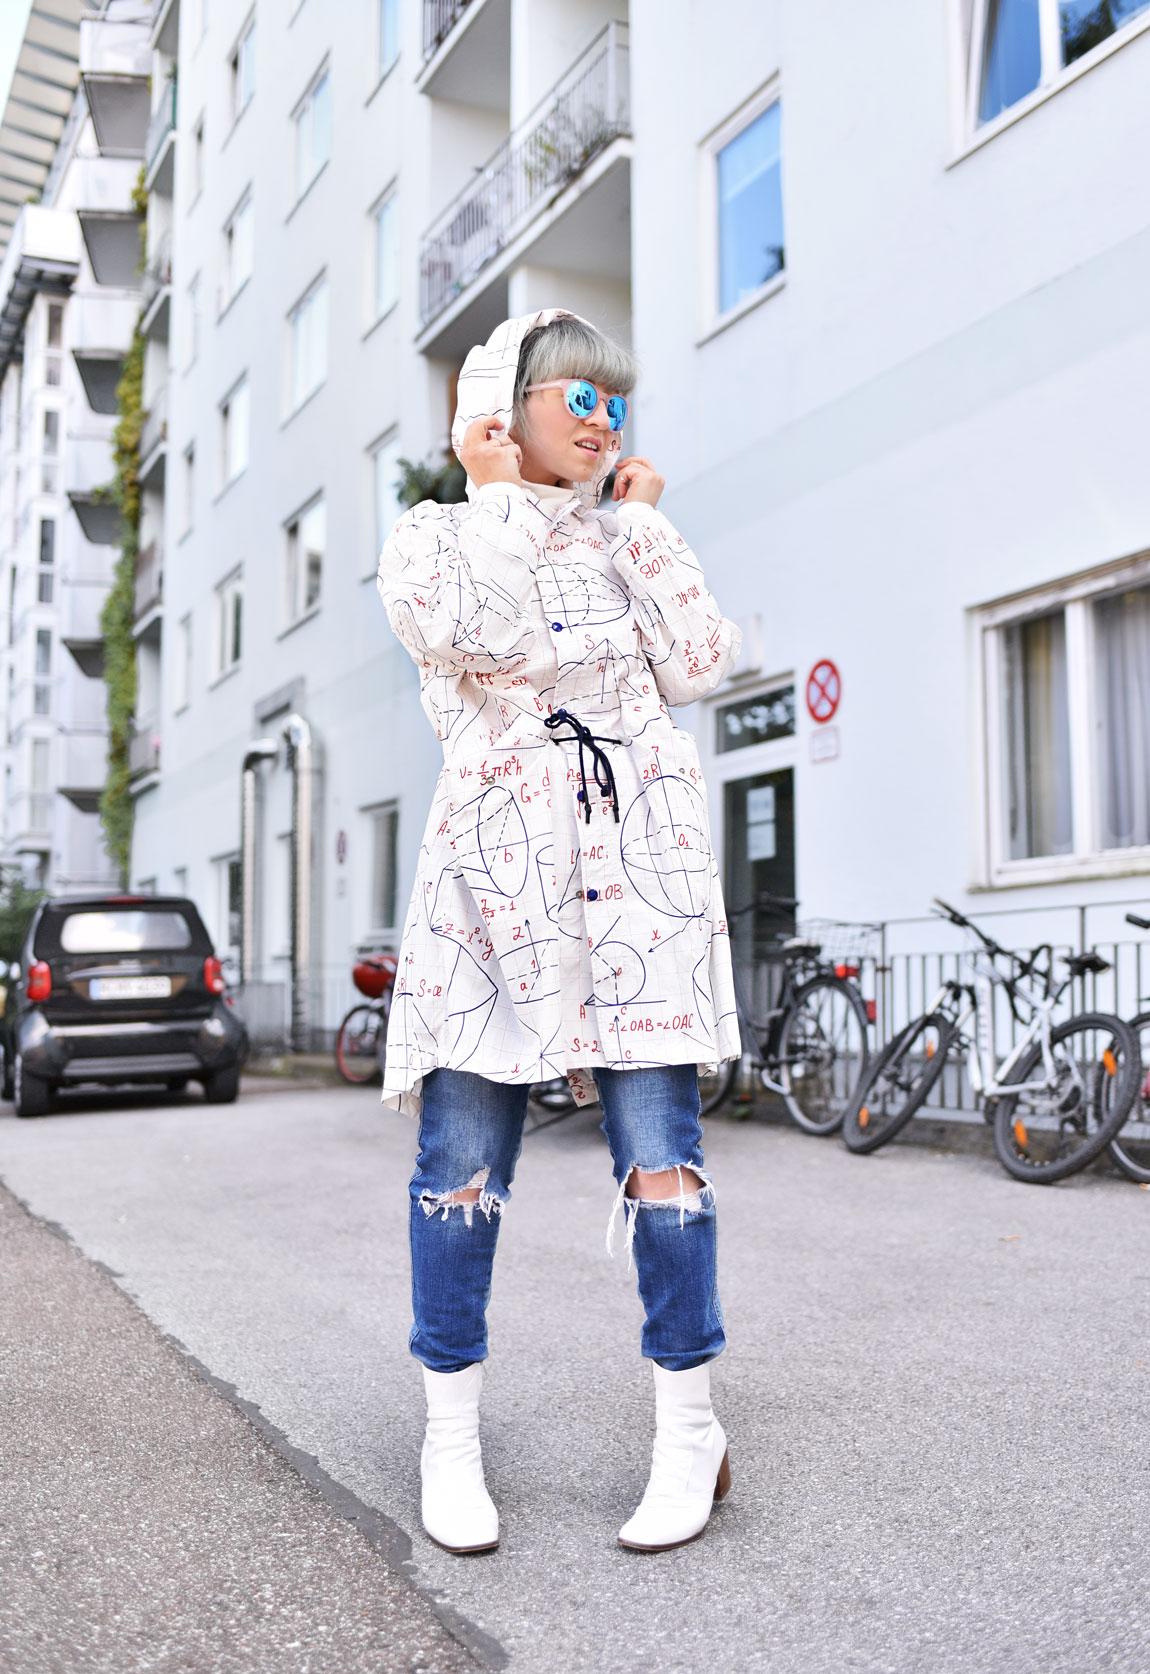 dezzal, nachgesternistvormorgen, fashionblogger, modeblogger, muenchen, regenjacke, suess, outfit, herbst, streetstyle